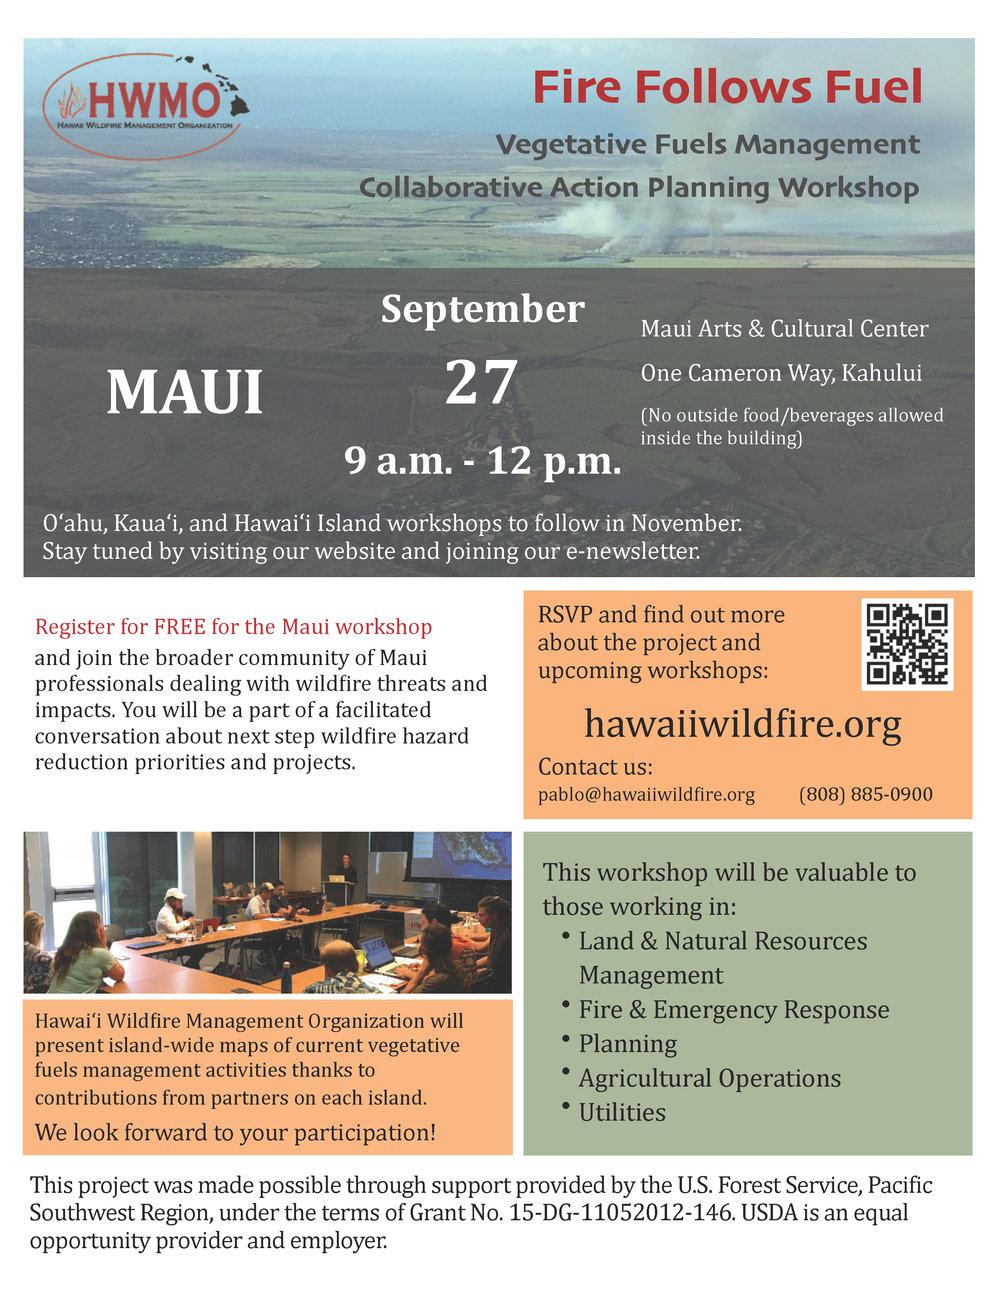 Maui Vegetative Fuels Management Collaborative Action Planning Flyer.jpg